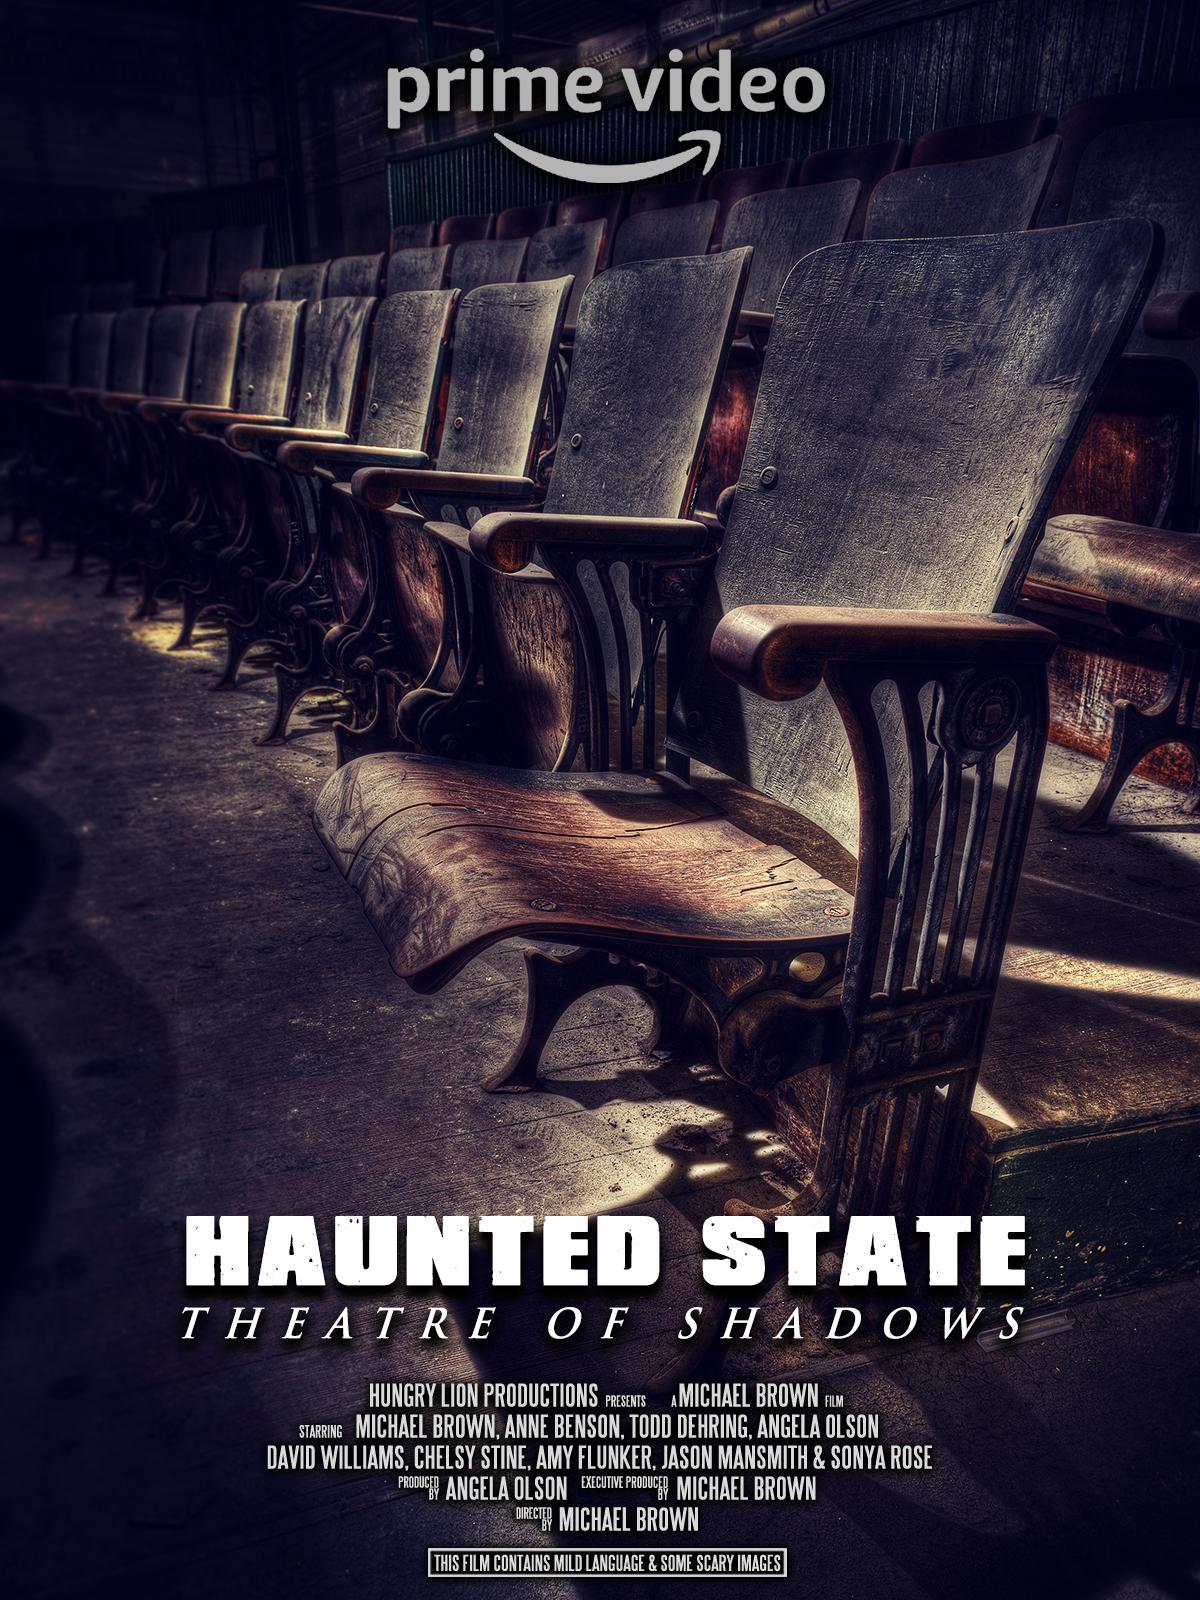 Haunted State: Theatre of Shadows (2017) - IMDb